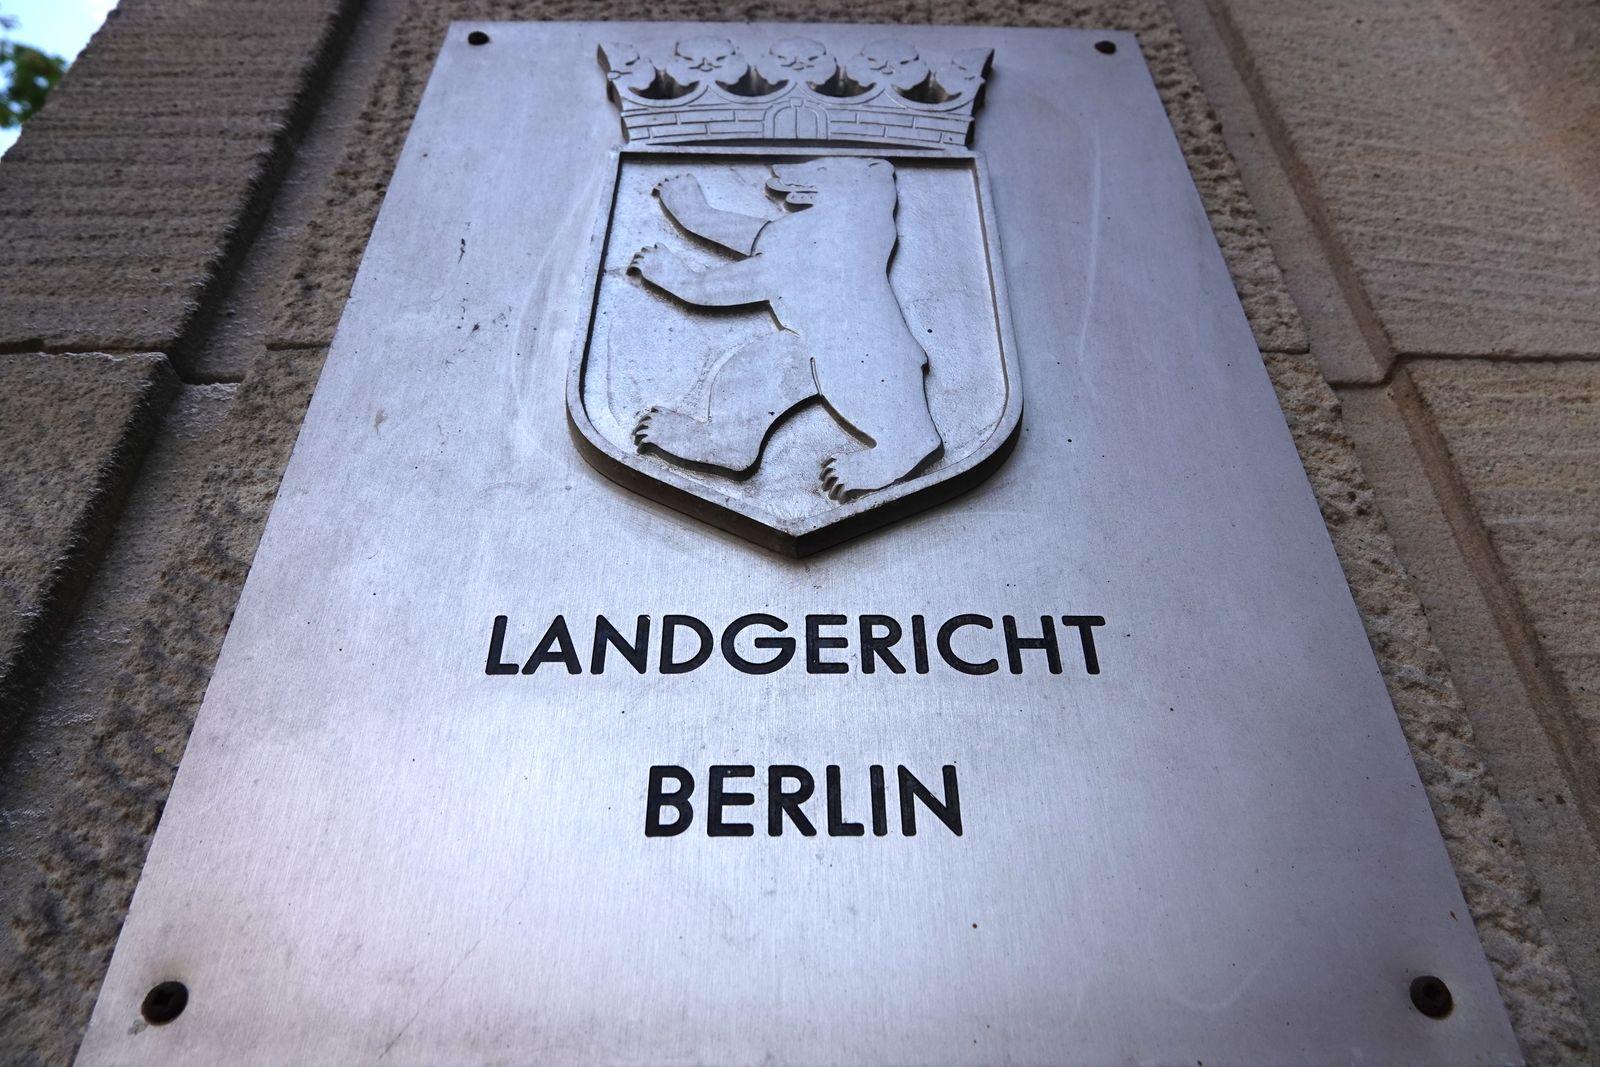 Landgericht Berlin